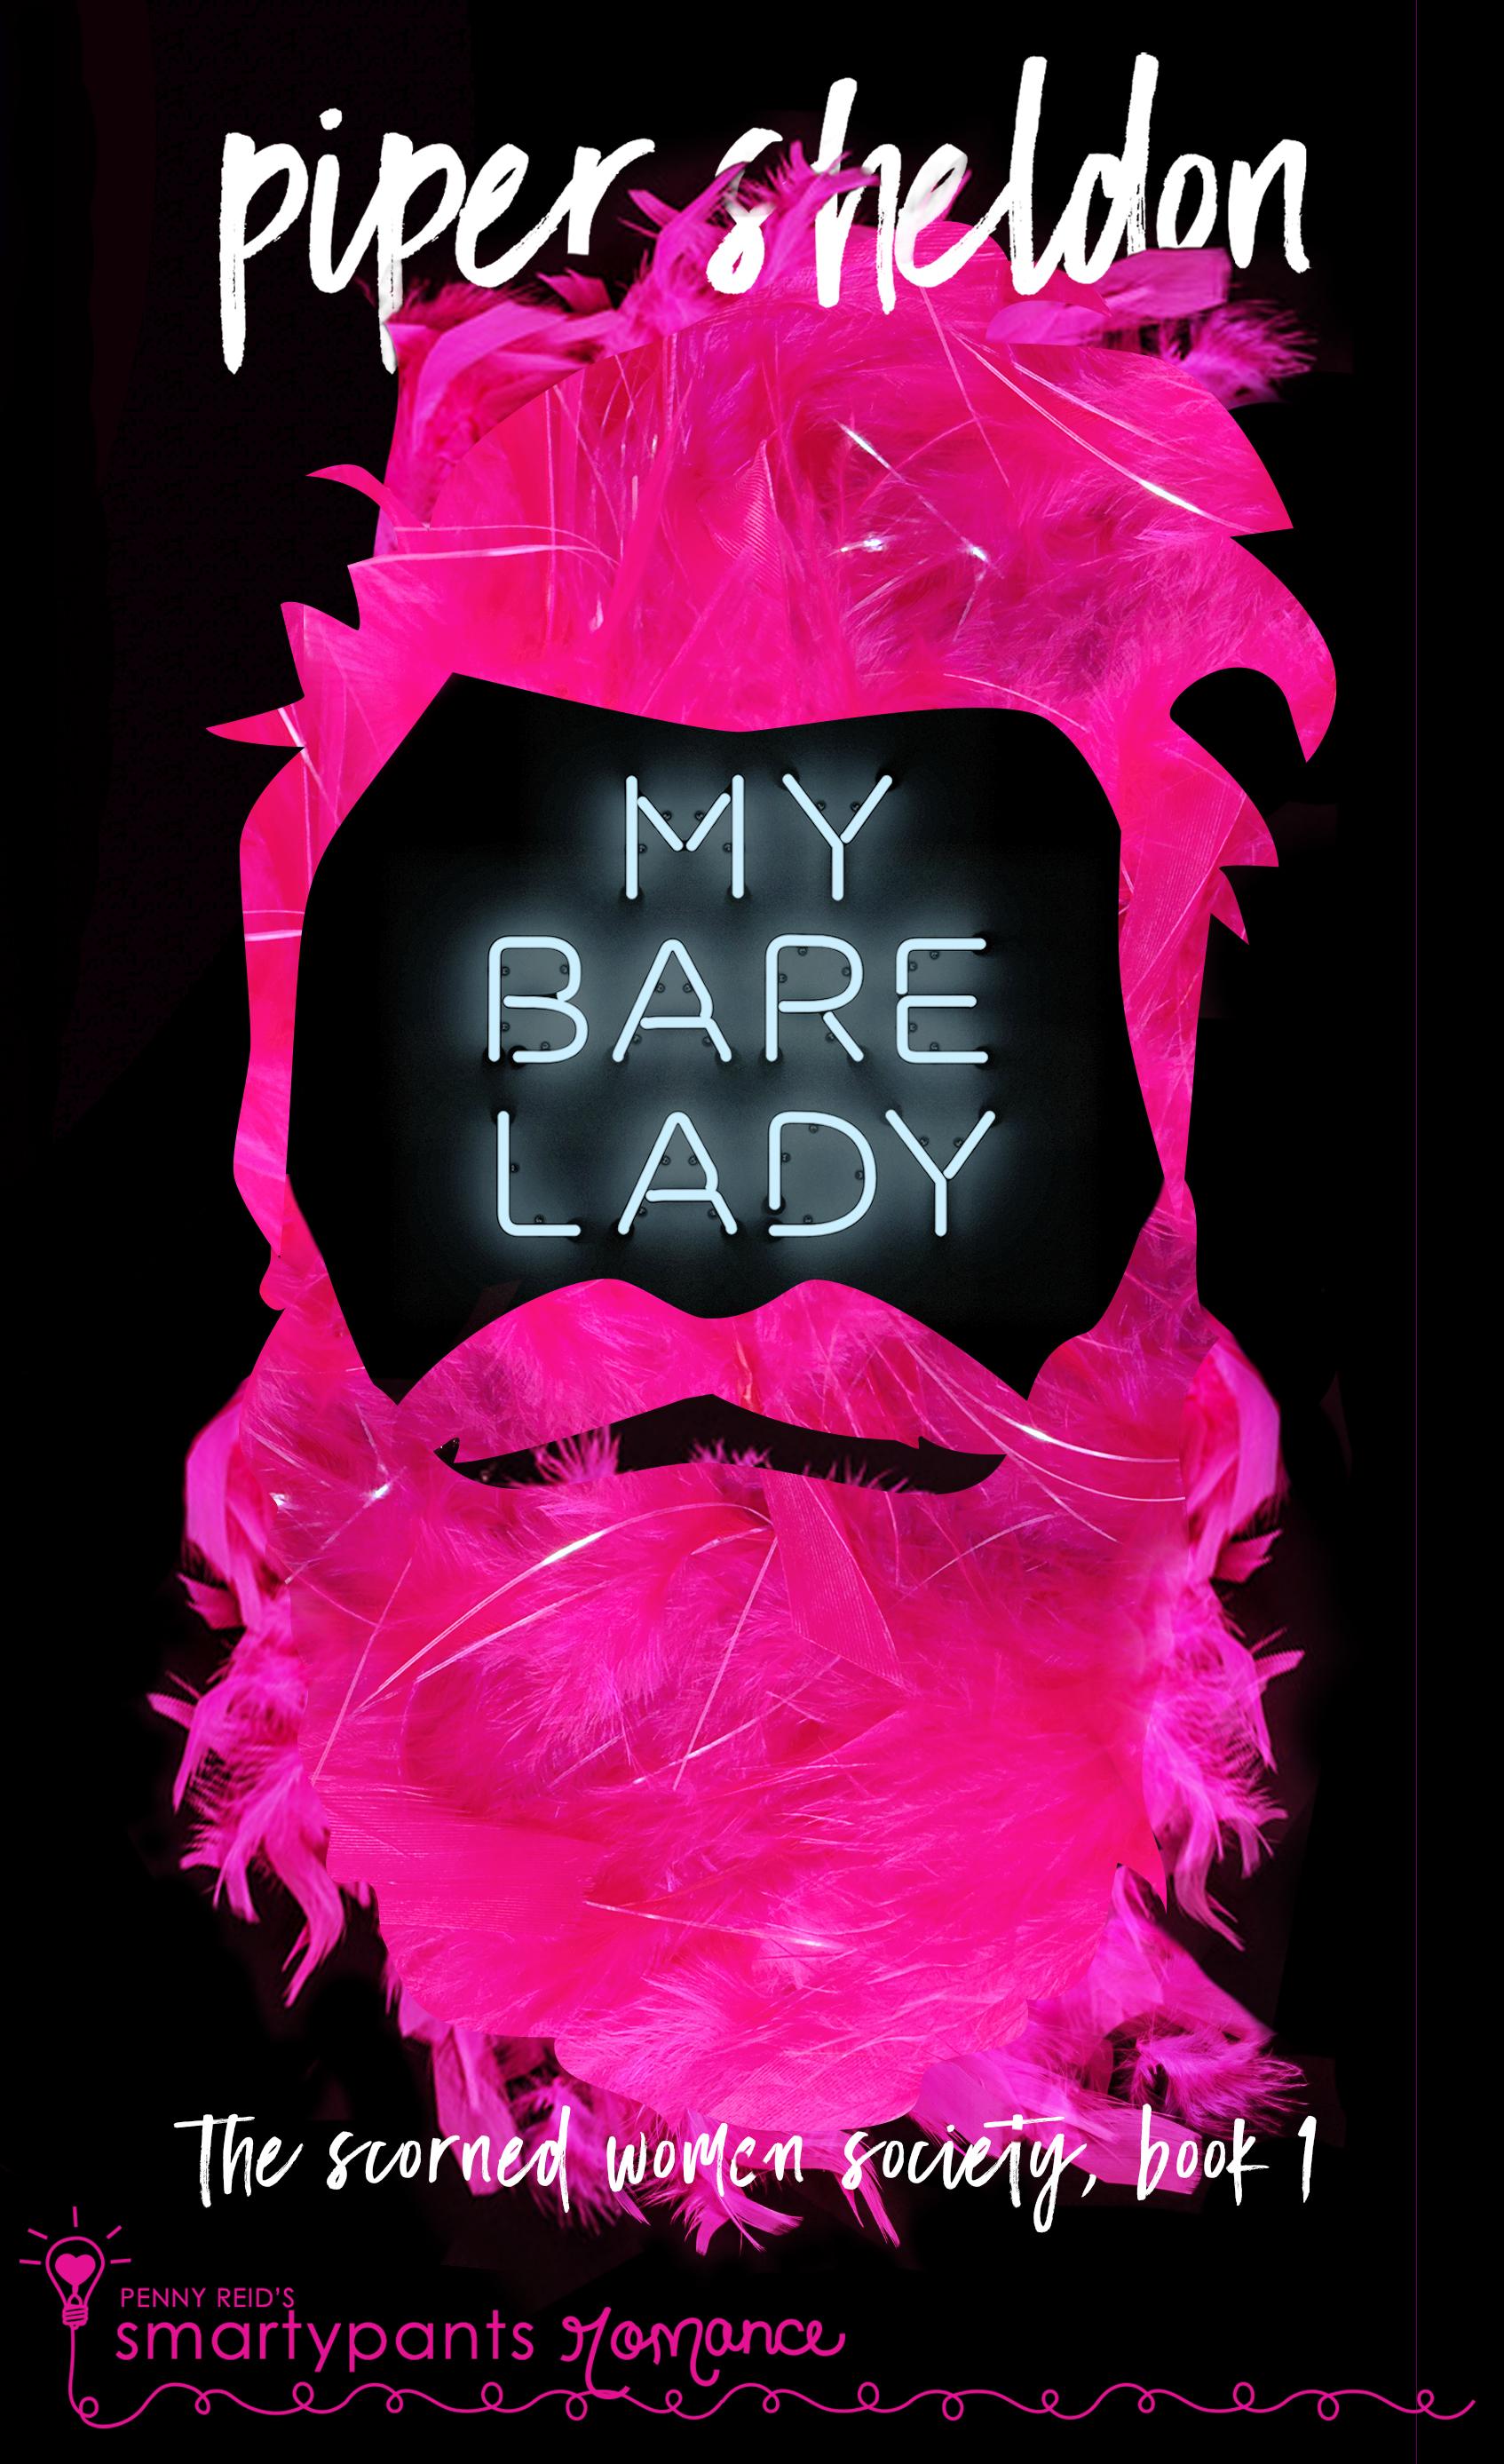 20190530_TSWS01_My Bare Lady_Sheldon_KDP_FINAL - Copy